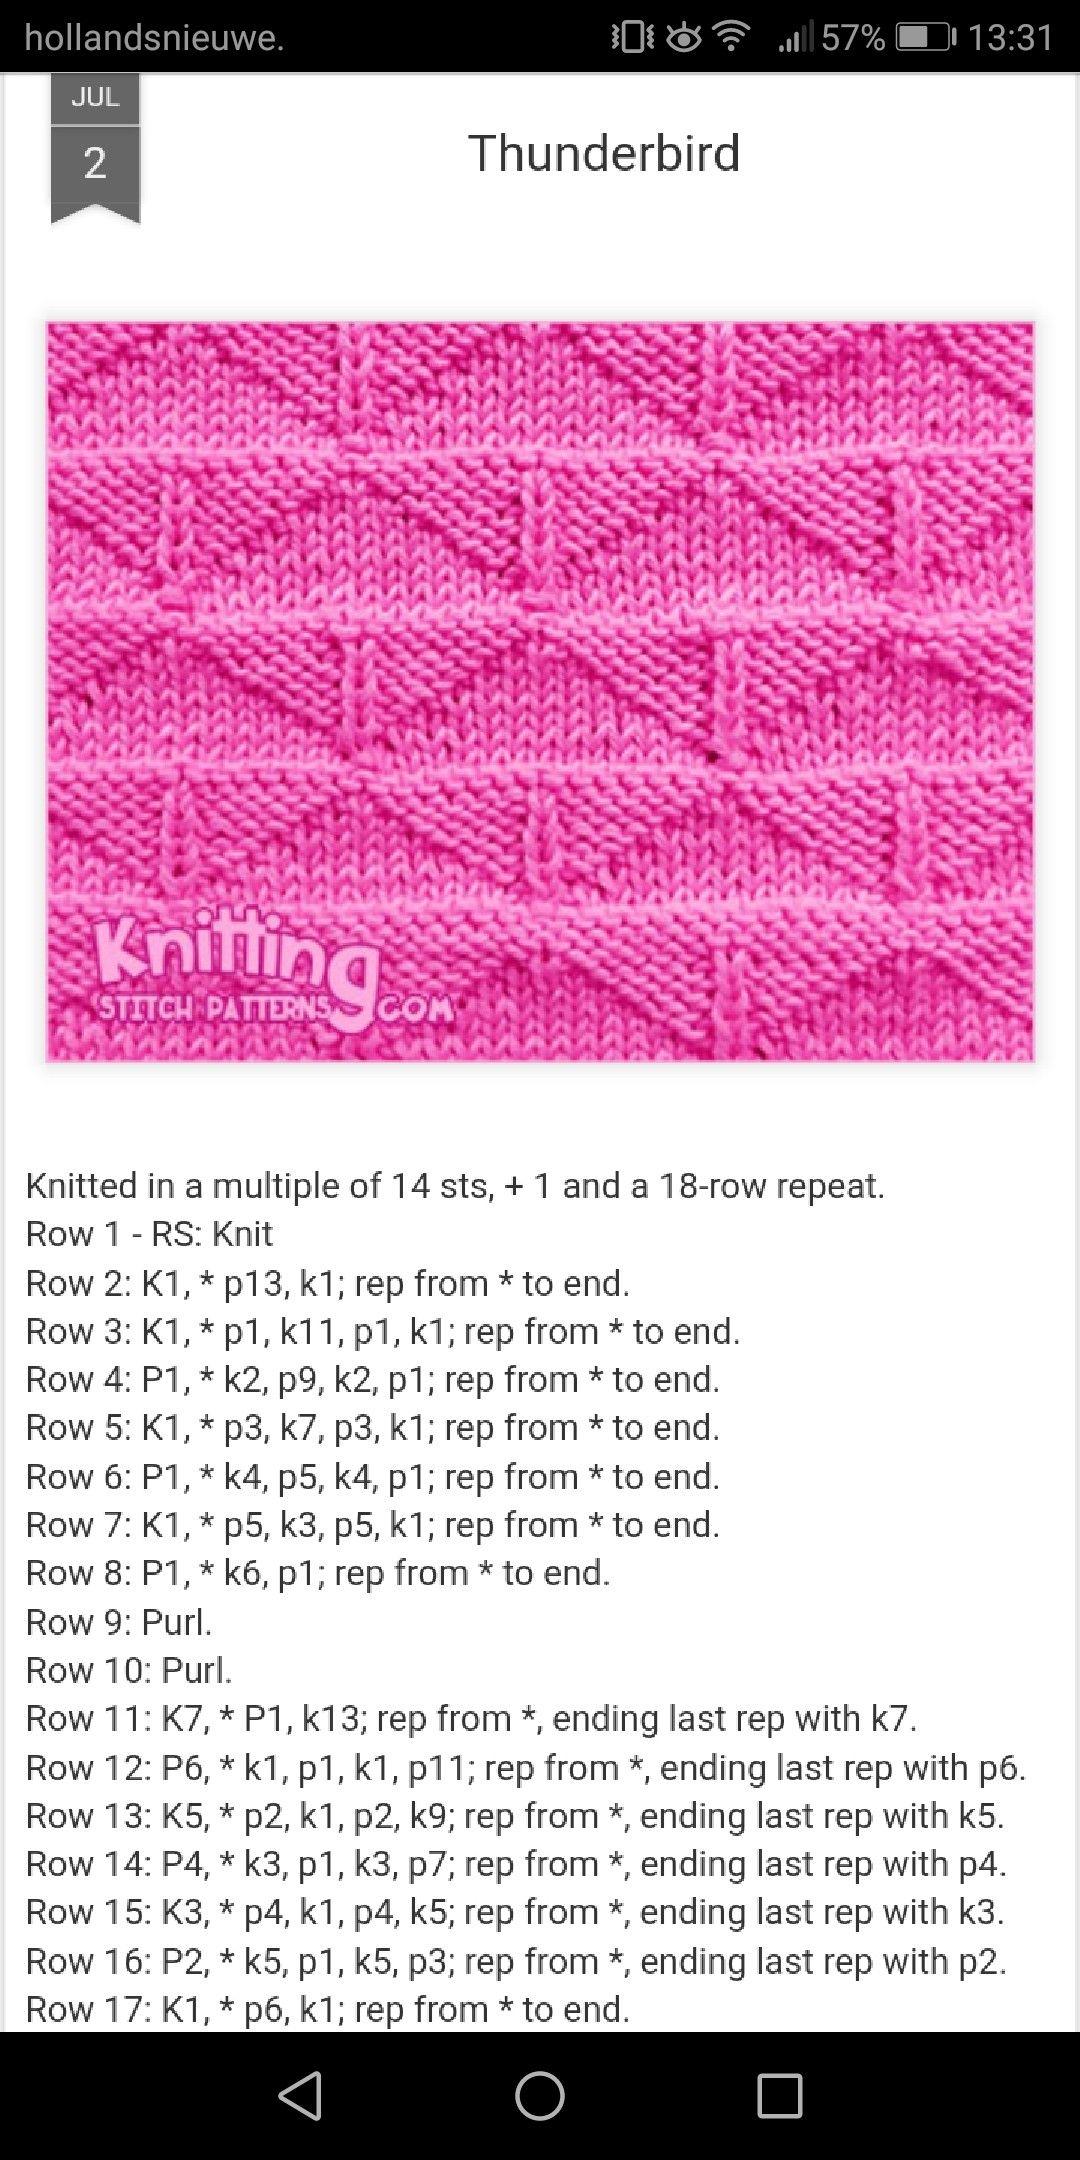 Thunderbird stich knit | DOS AGUJAS | Pinterest | Agujas, Tejidos y ...